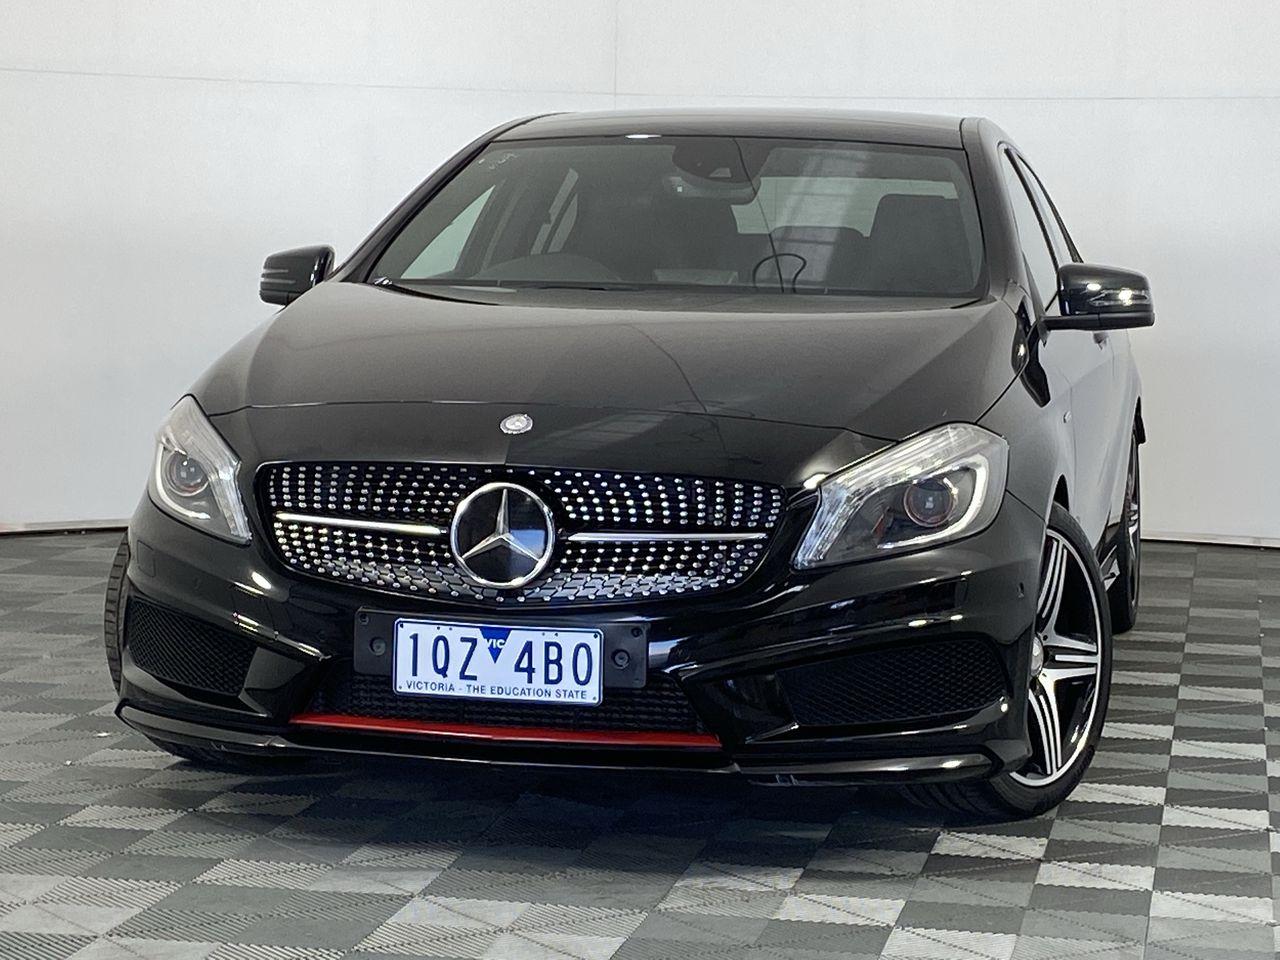 2014 Mercedes Benz A-Class A250 Sport W176 Automatic Hatchback